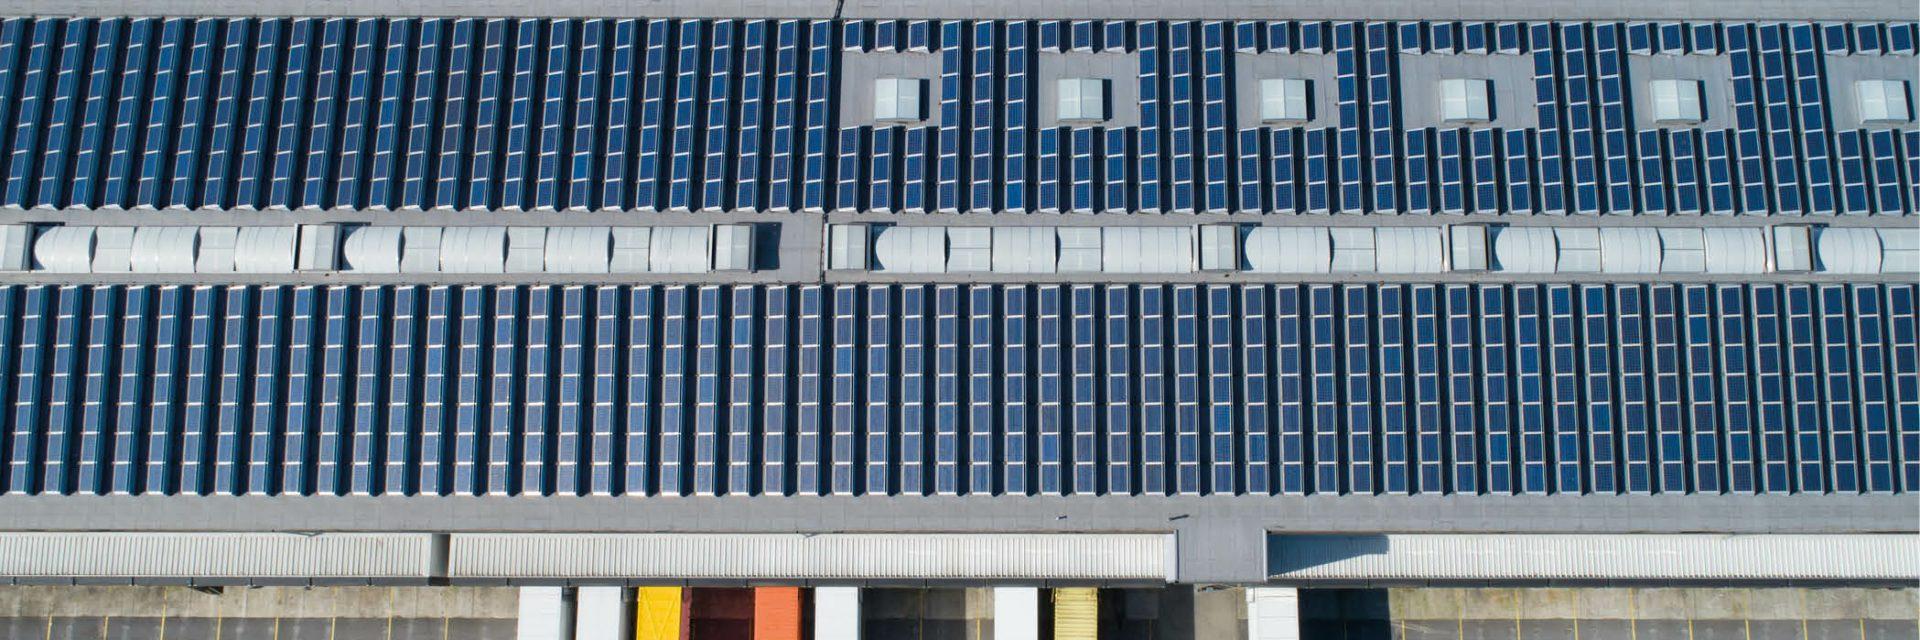 distribution-centre-rooftop-solar